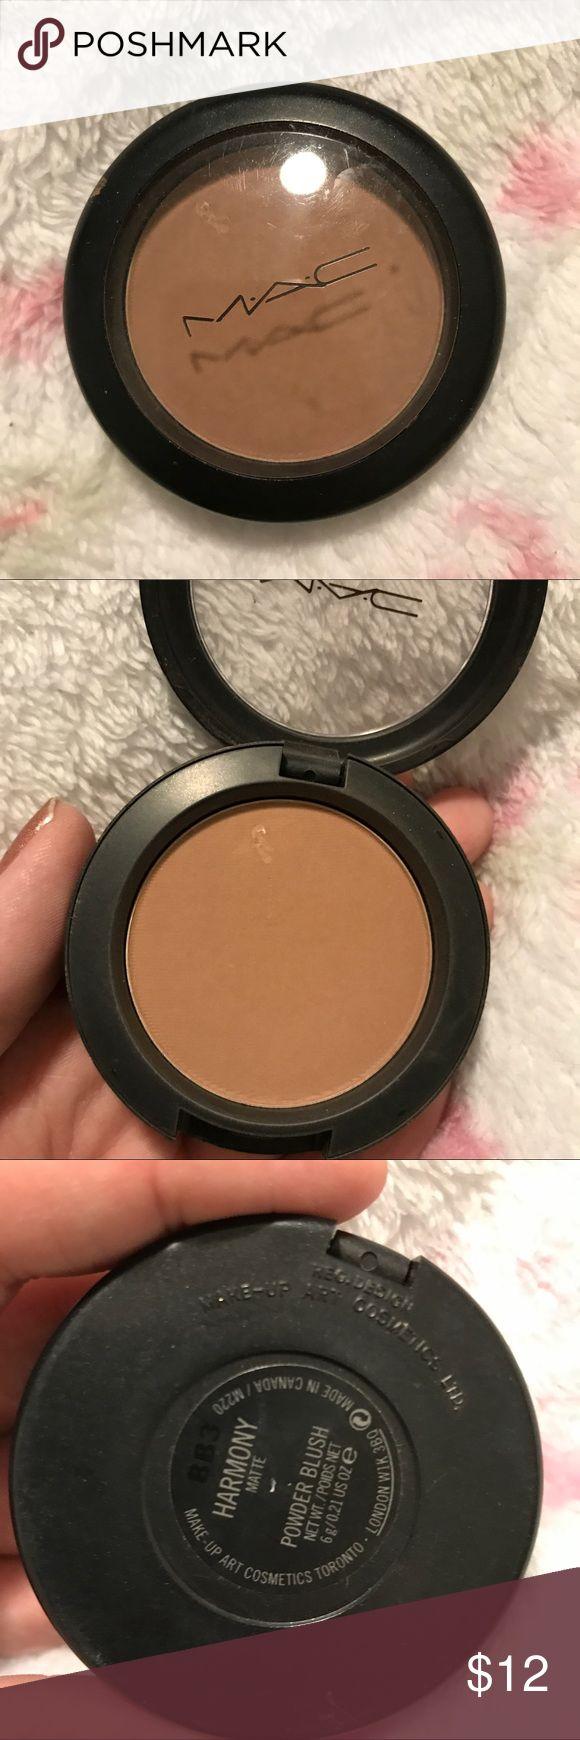 MAC Harmony Matte Blush Can also work as a contour powder on fair skin. Used a few times. 🚫 Trades 🚫 PayPal MAC Cosmetics Makeup Blush